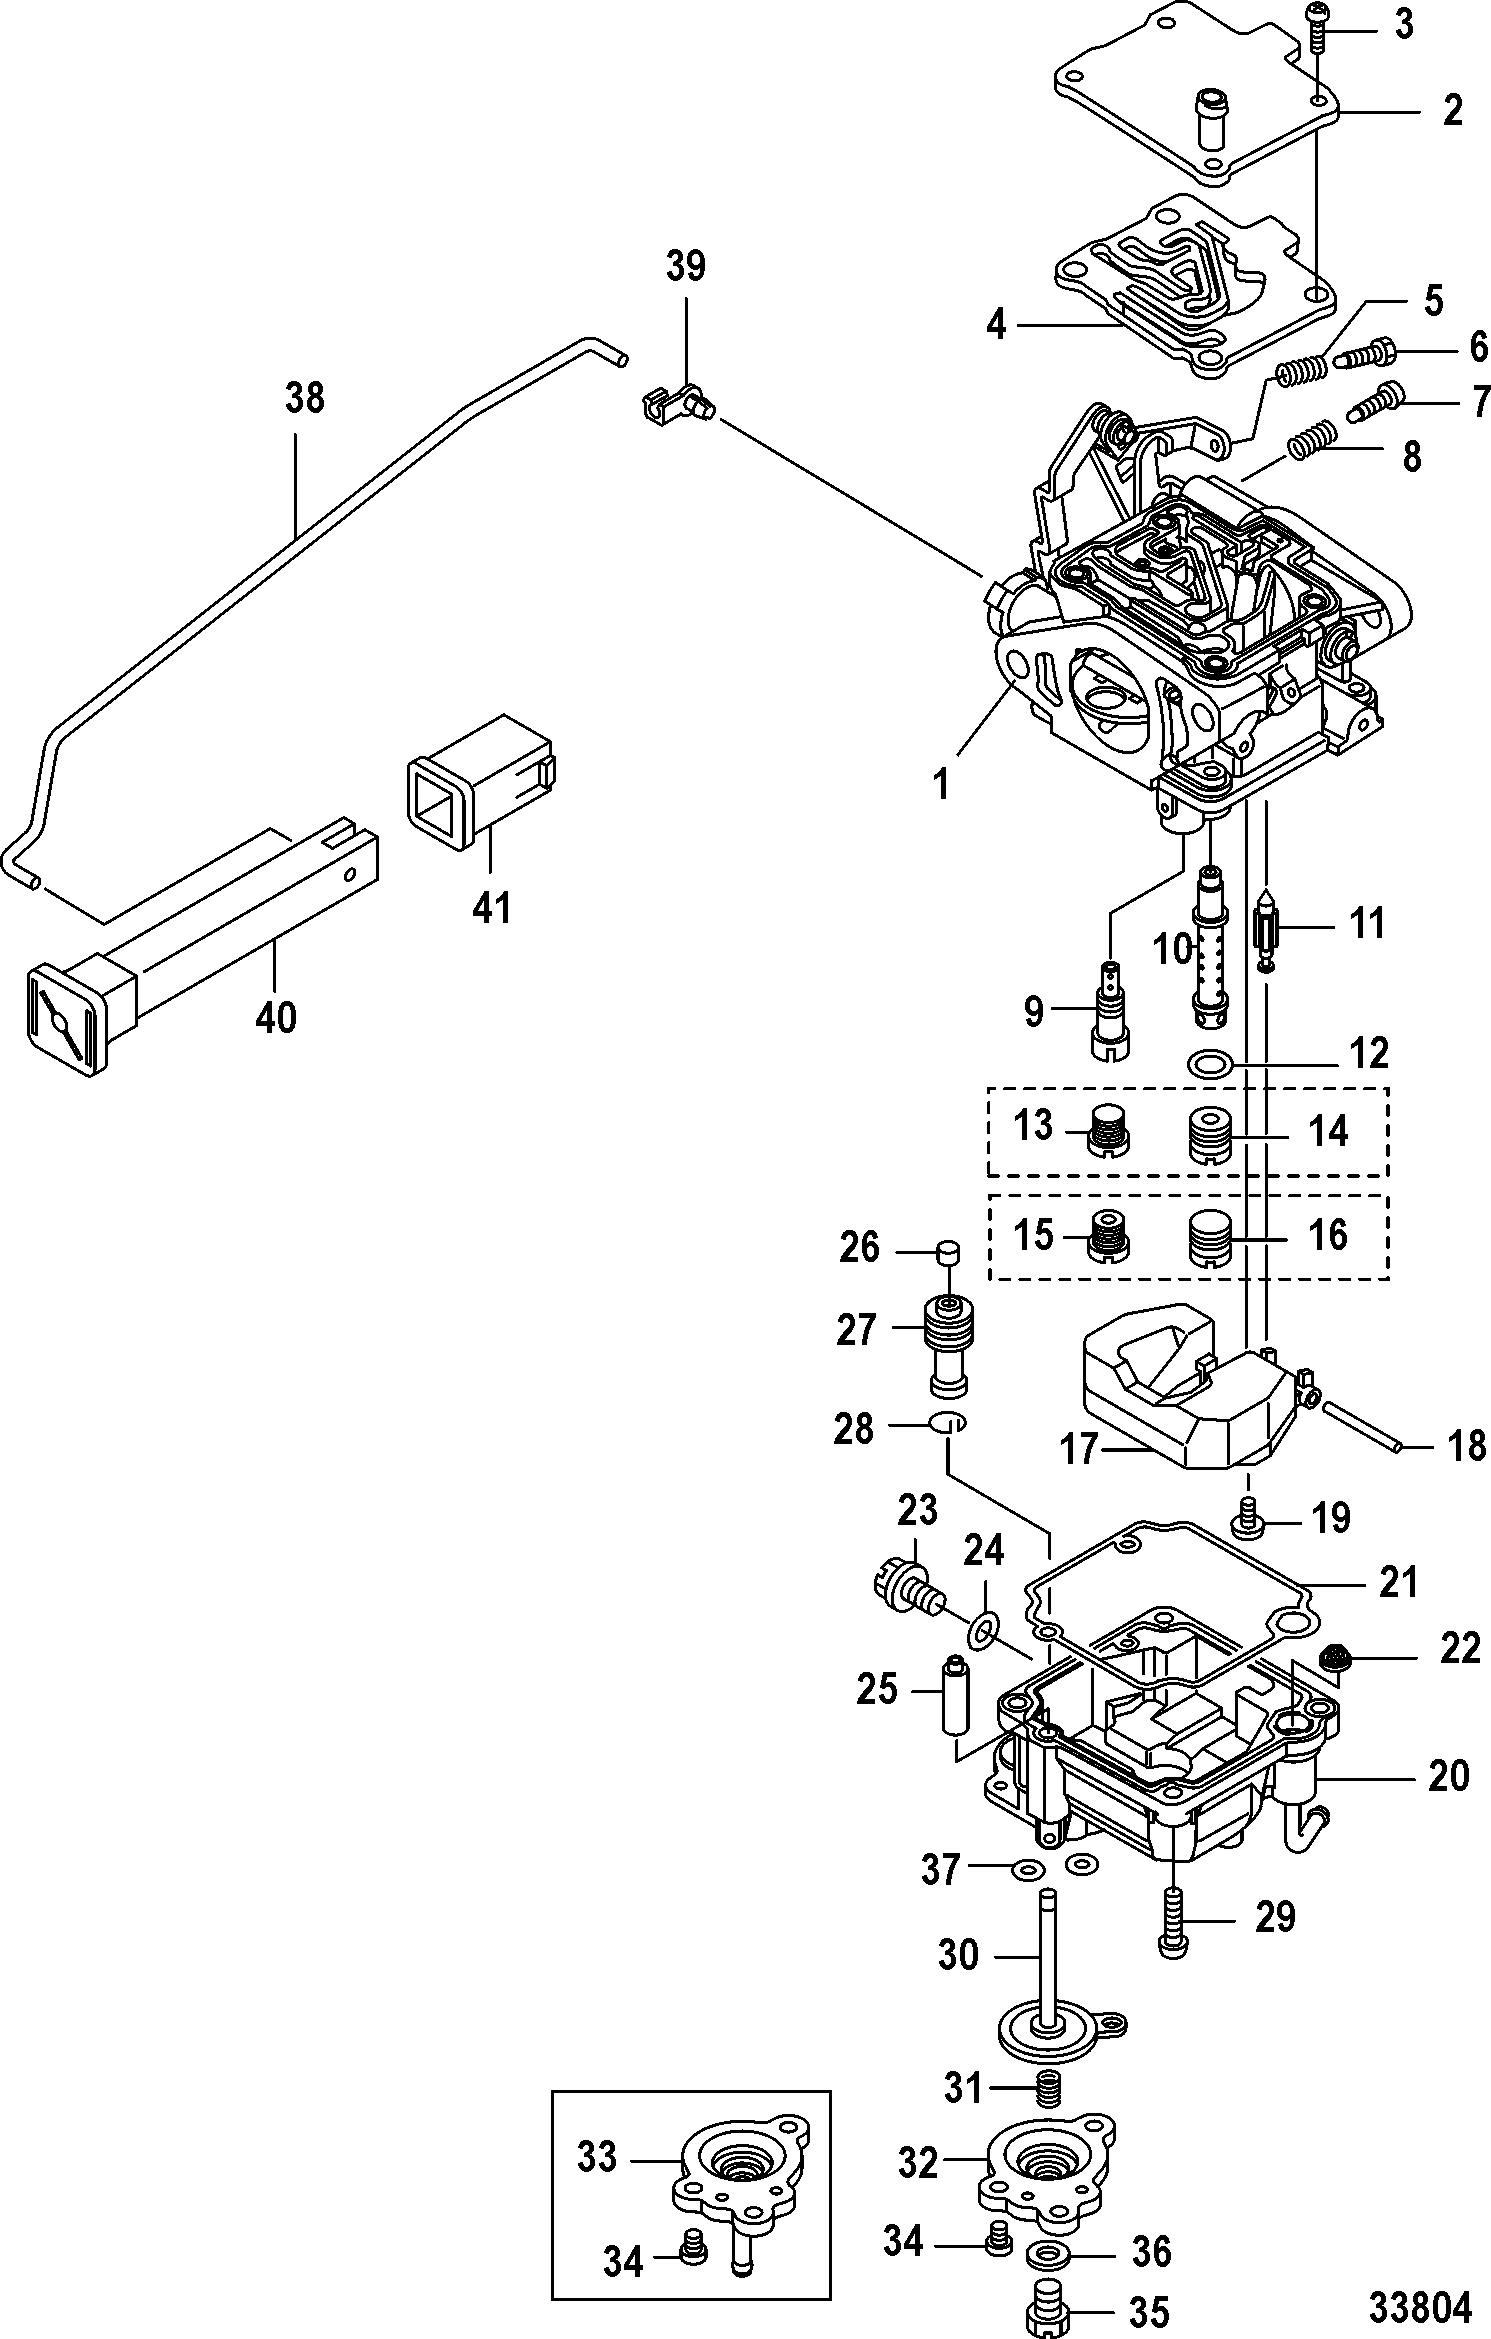 Каталог запчастей mariner 20 carb(2cyl)(4 stroke) 0r235168 \u0026 upMercury Outboard 0r235168 Up Gear Housing Propeller Shaft Diagram #8